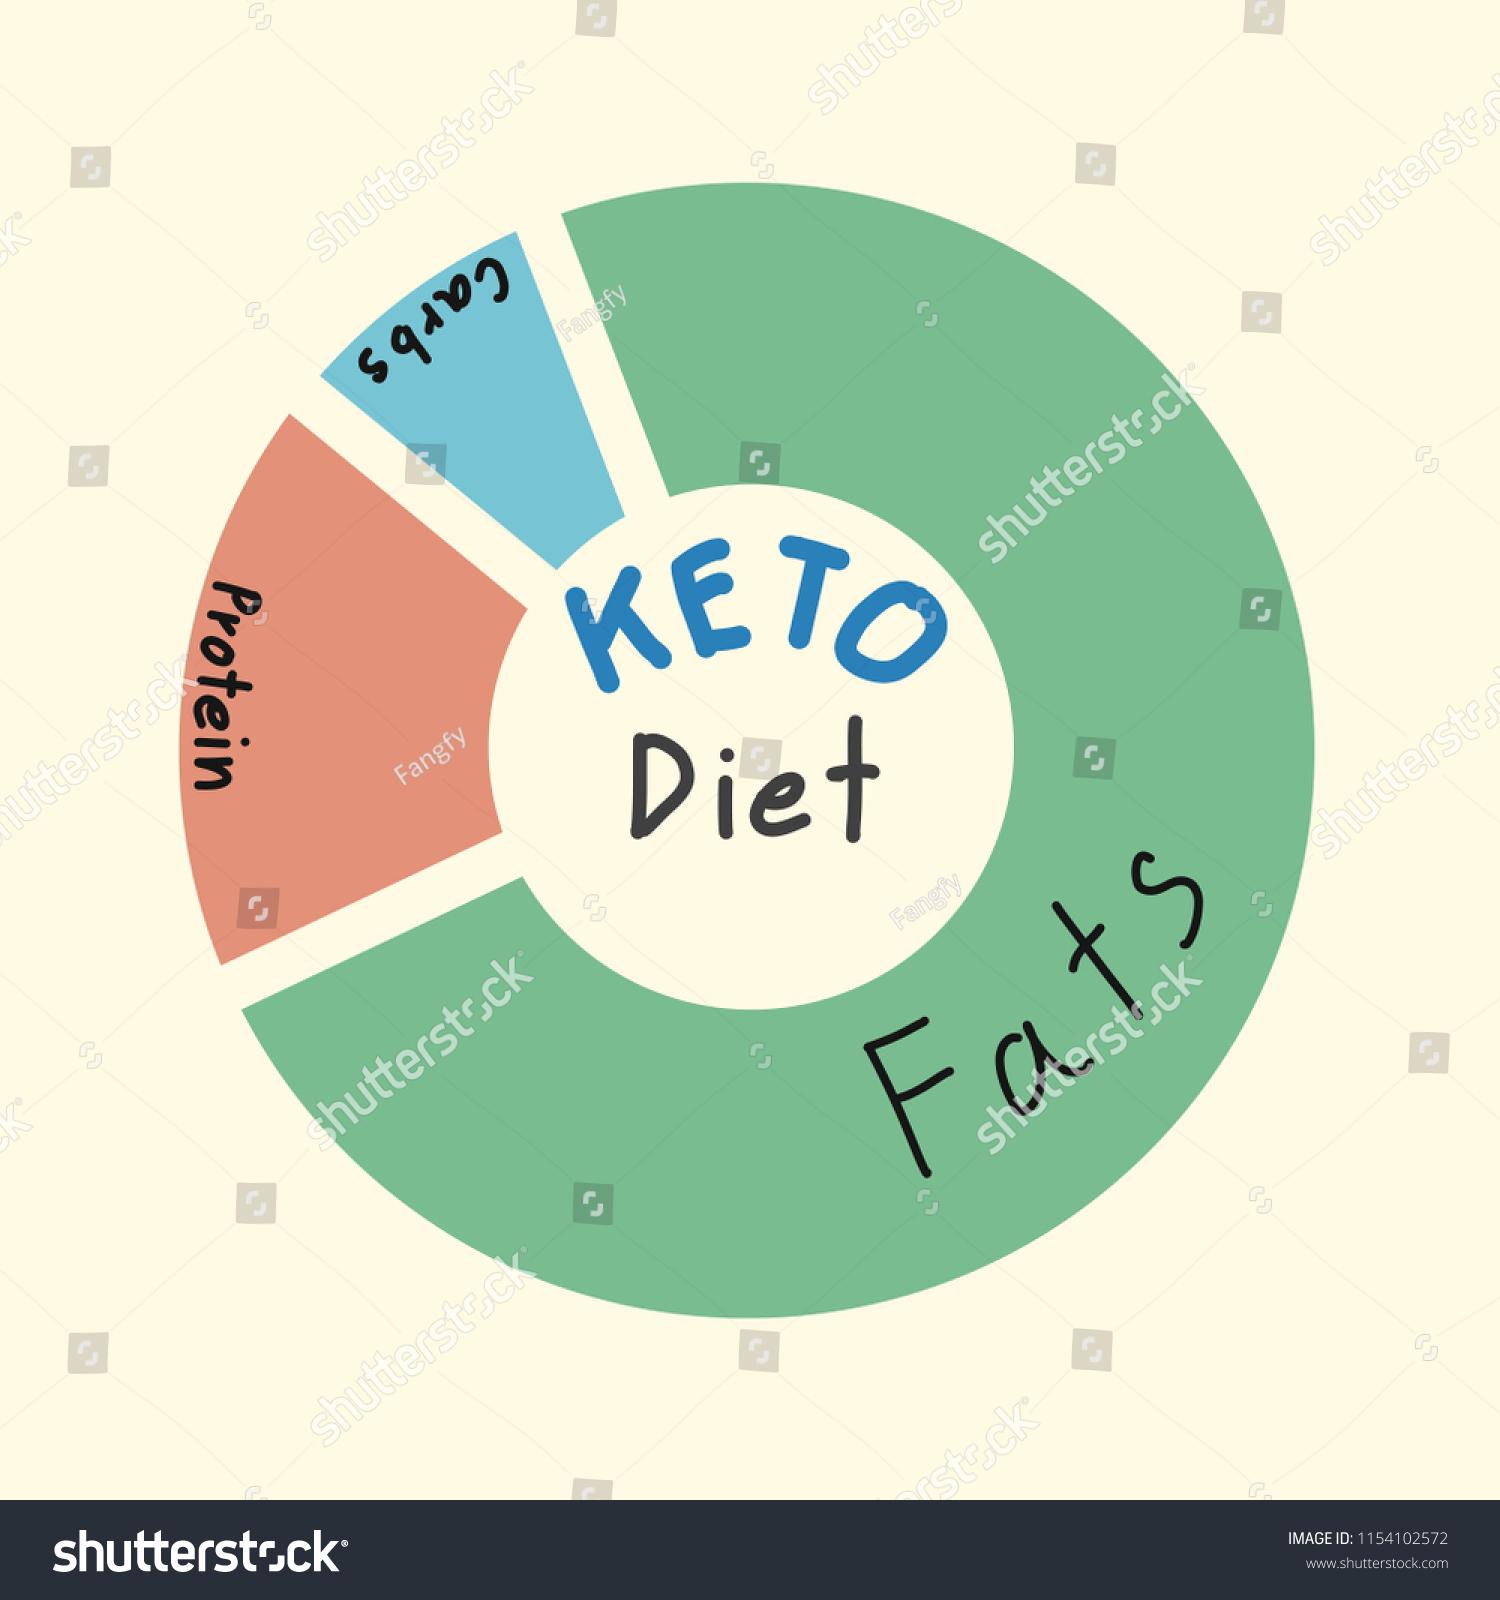 ketogenic diet pie diagram showing percentage stock vector royalty rh shutterstock com